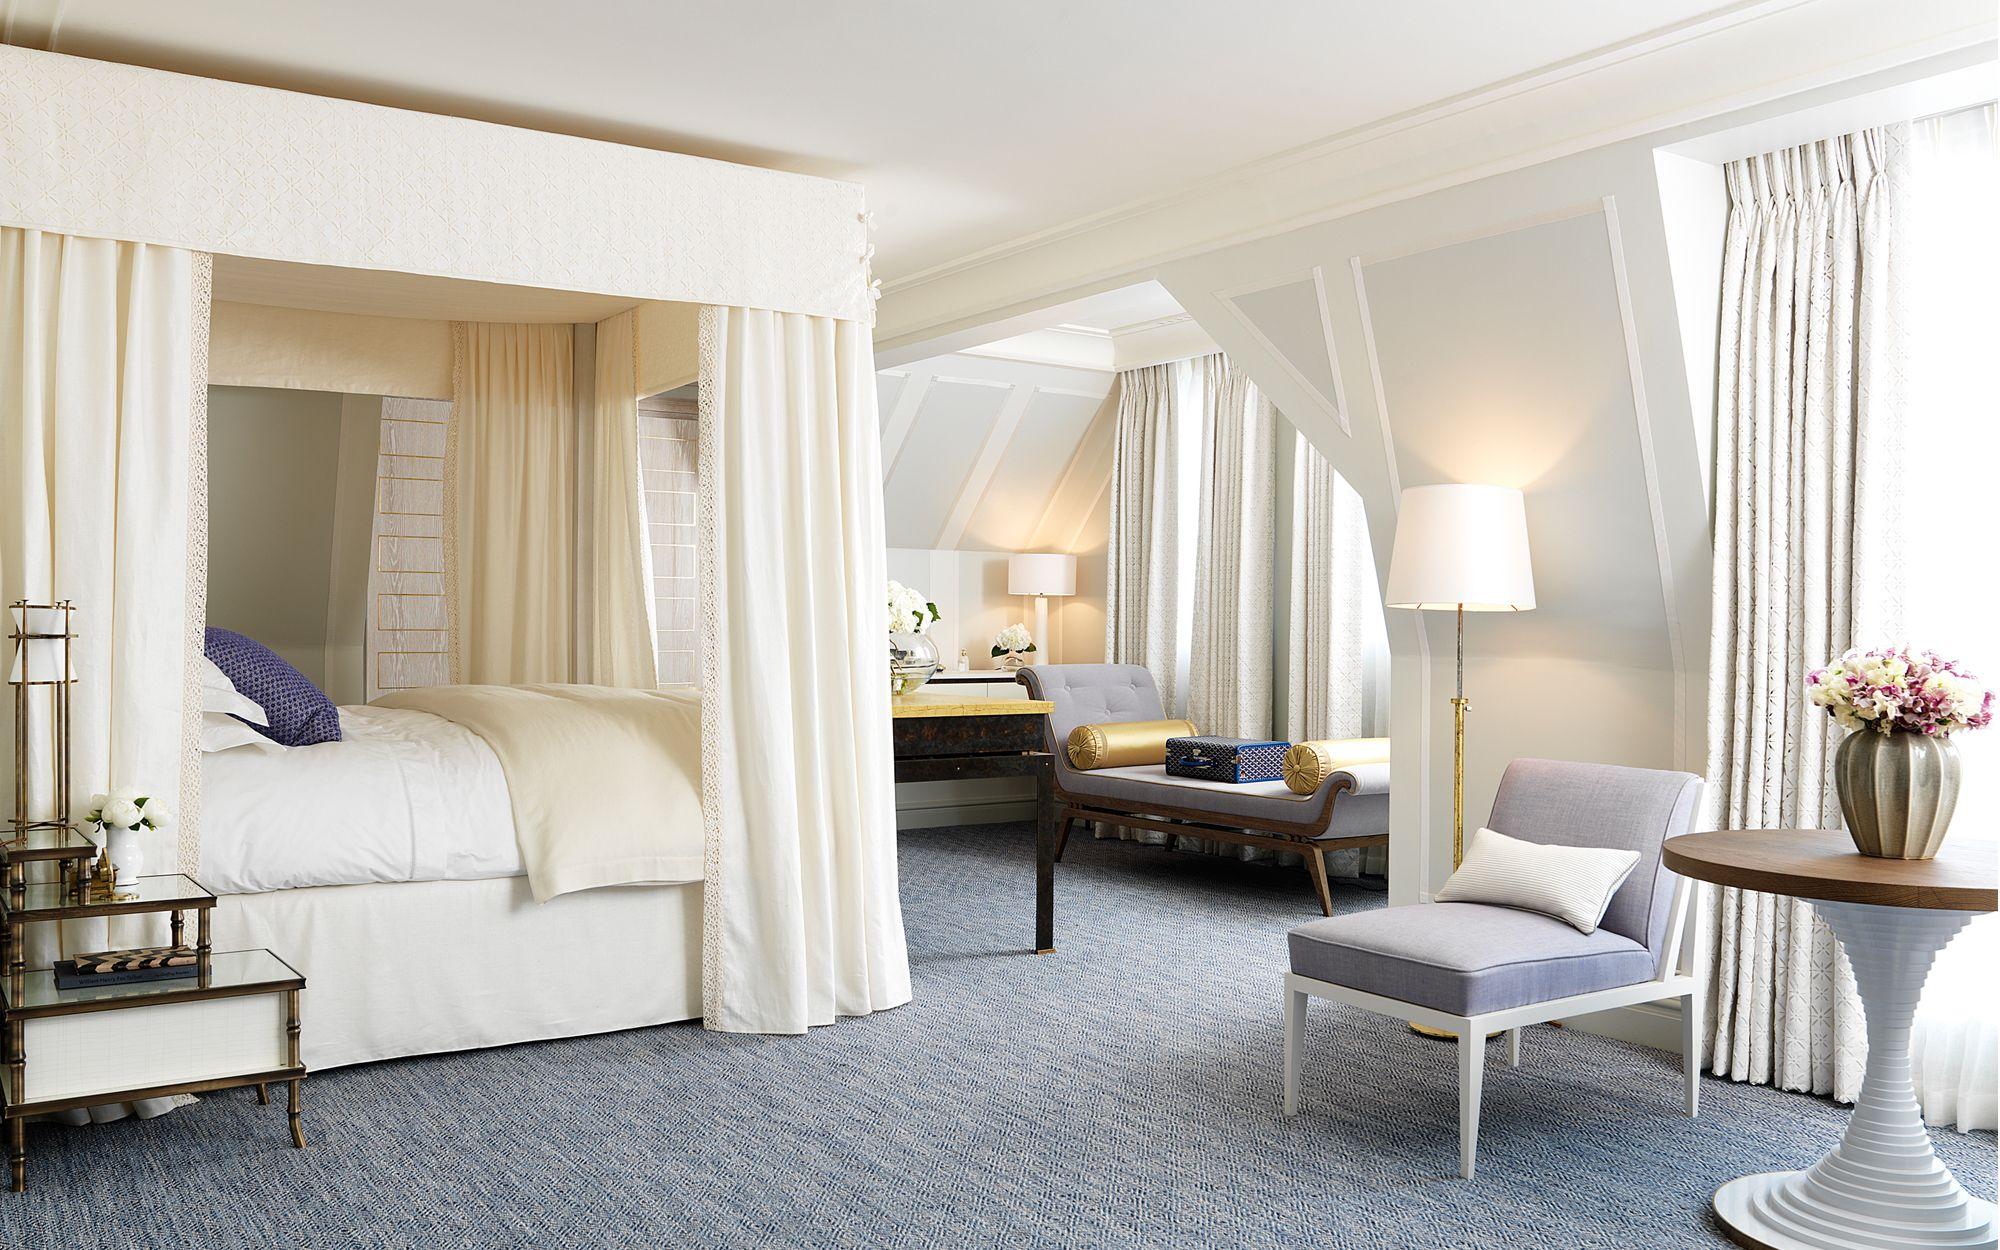 luruxy lifestyle master bedroom 10 David Collins Master Bedroom Ideas b293fbe1d8c6659e71313f5294307d3c